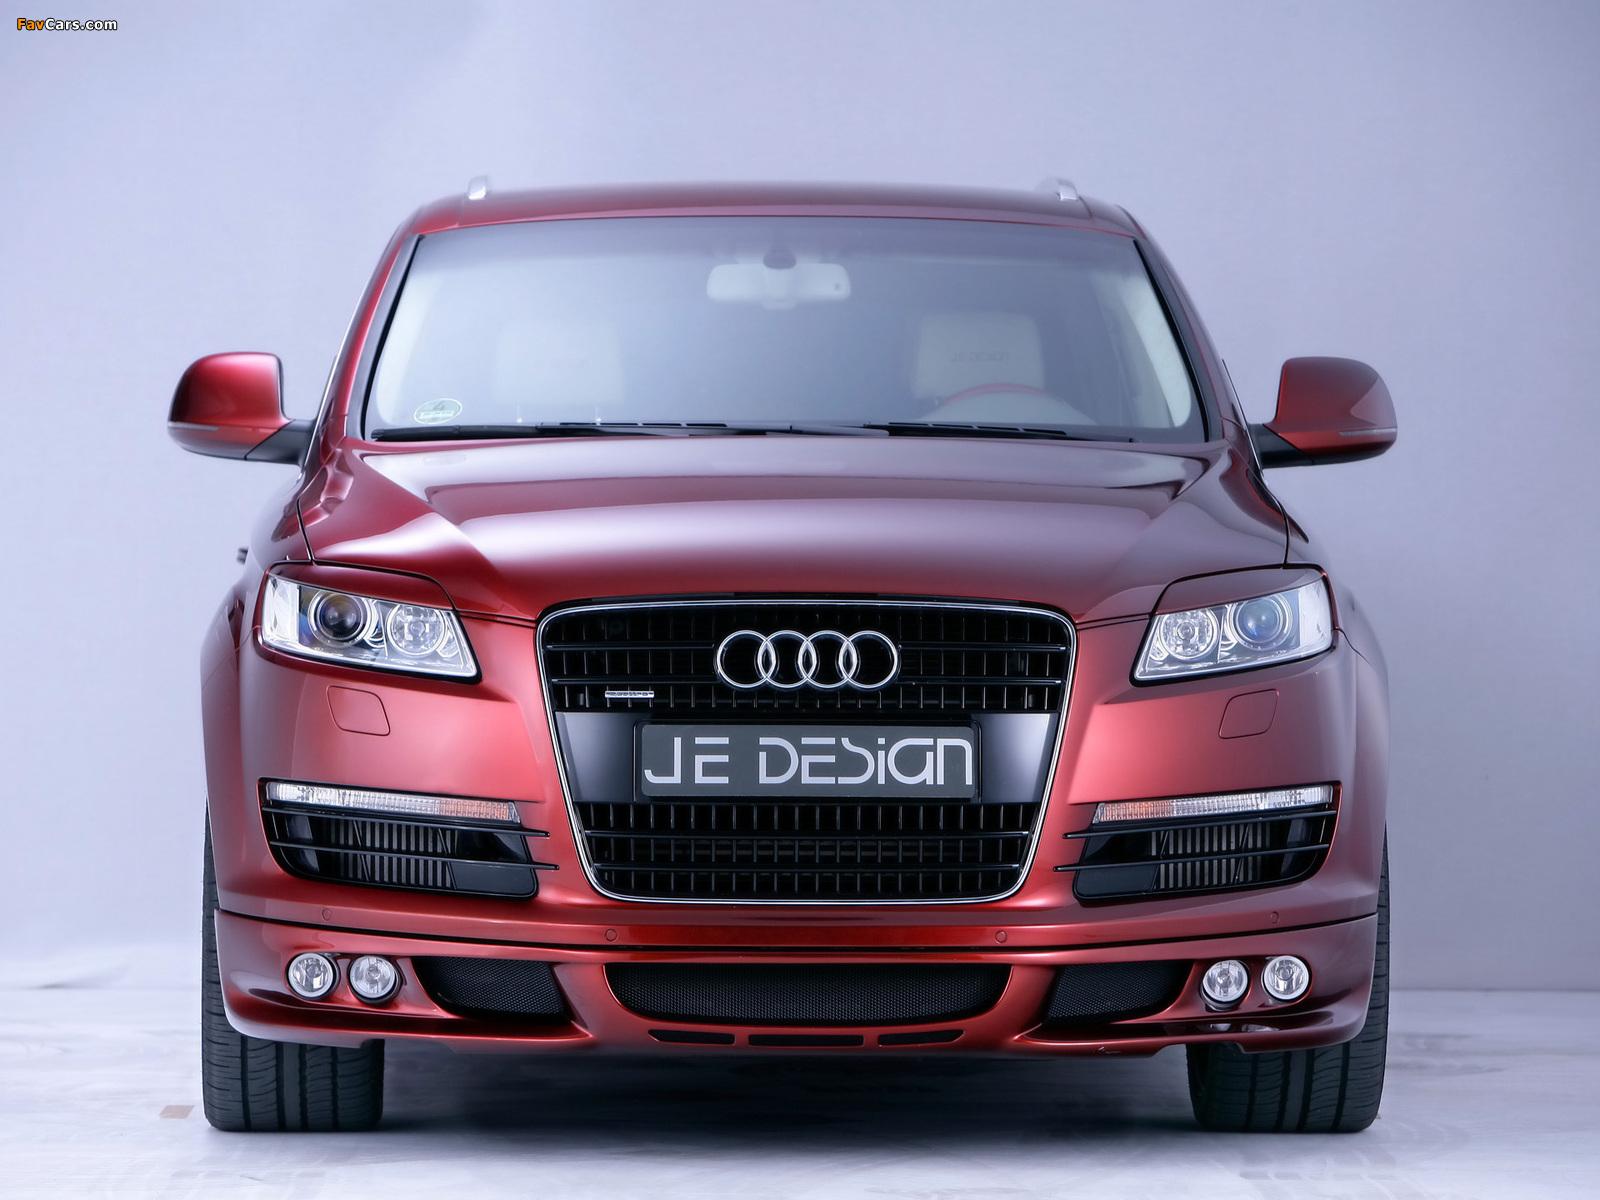 Je Design Audi Q7 Street Rocket 2007 wallpapers (1600 x 1200)